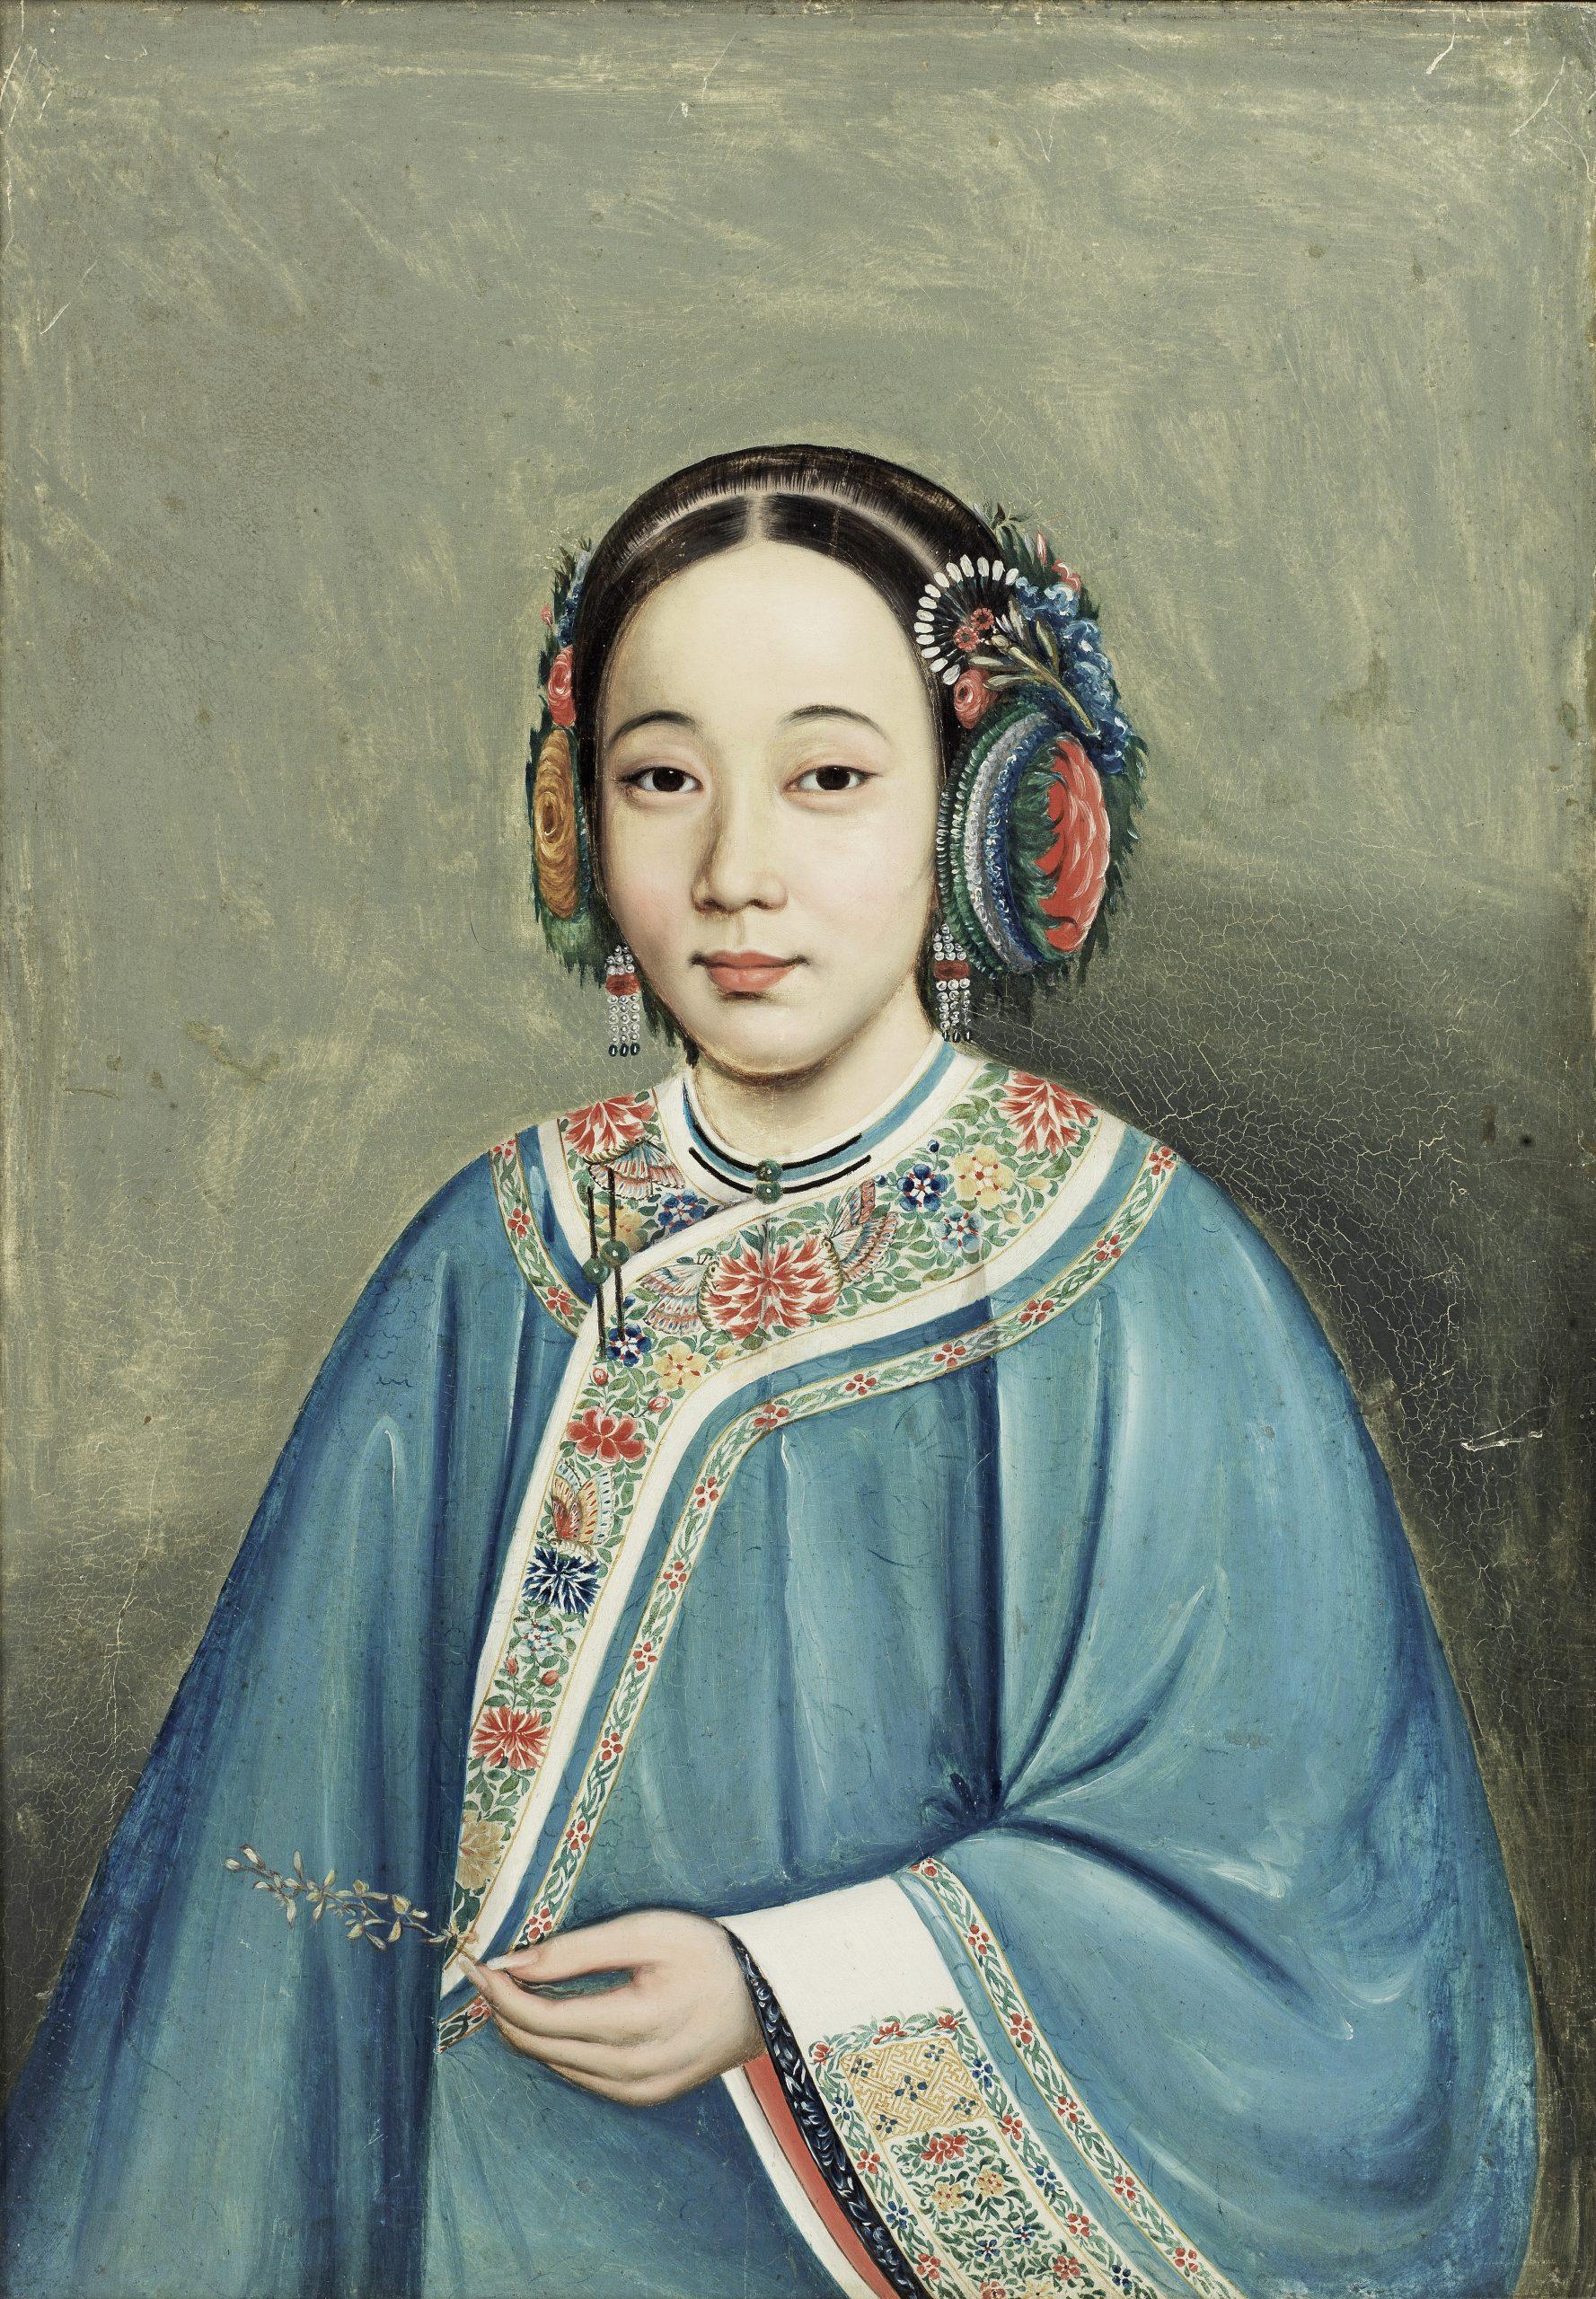 School of Lamqua (circa 1830-1850), Portrait of a Beauty